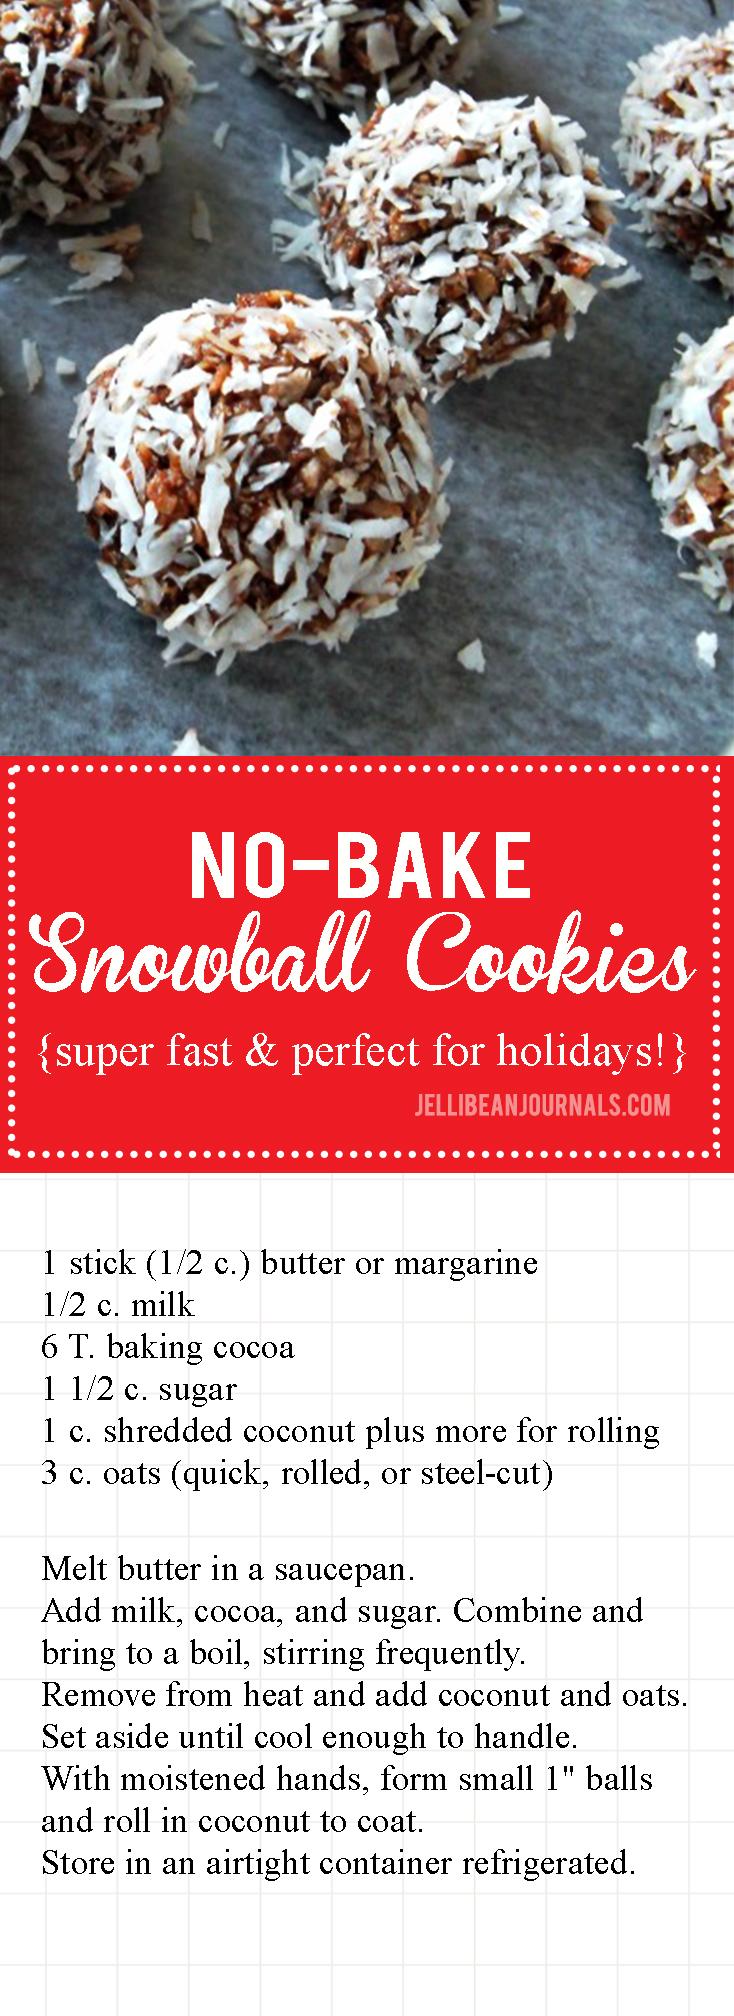 No-Bake Snowball Cookies   Jellibeanjournals.com